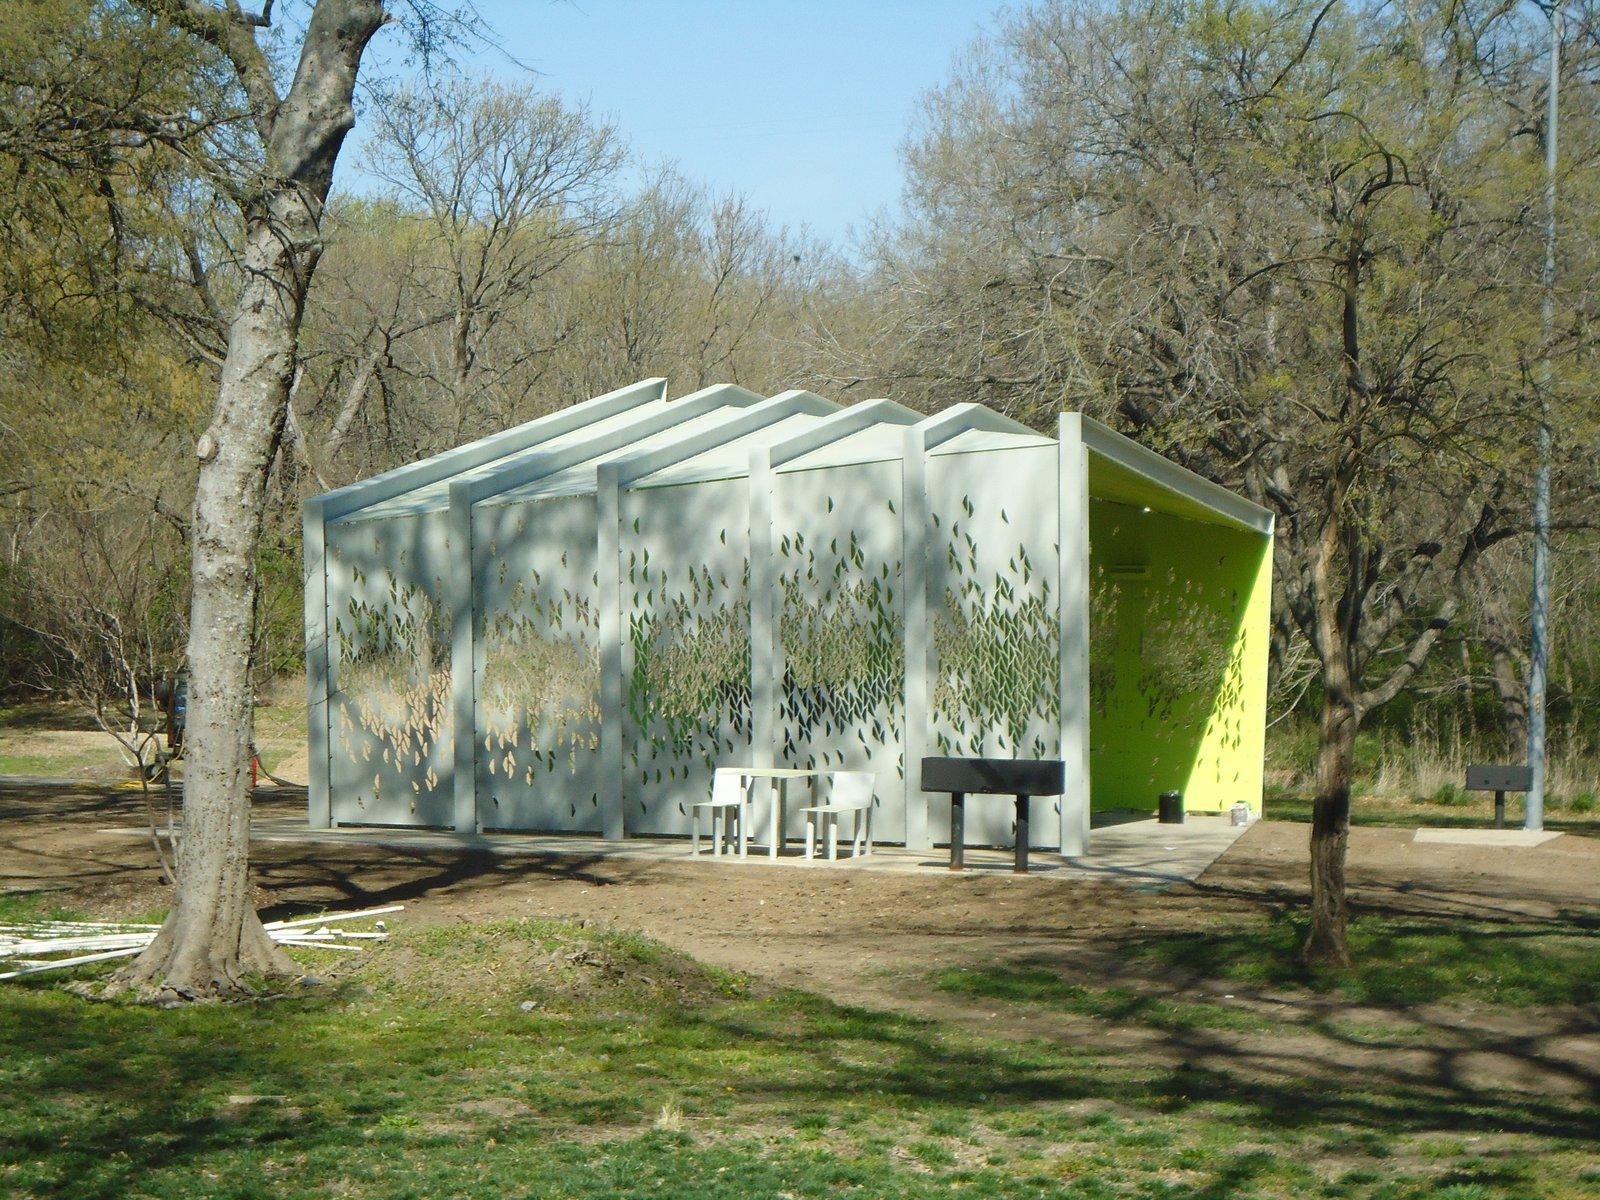 A Modern Park Pavilion Rises in Dallas